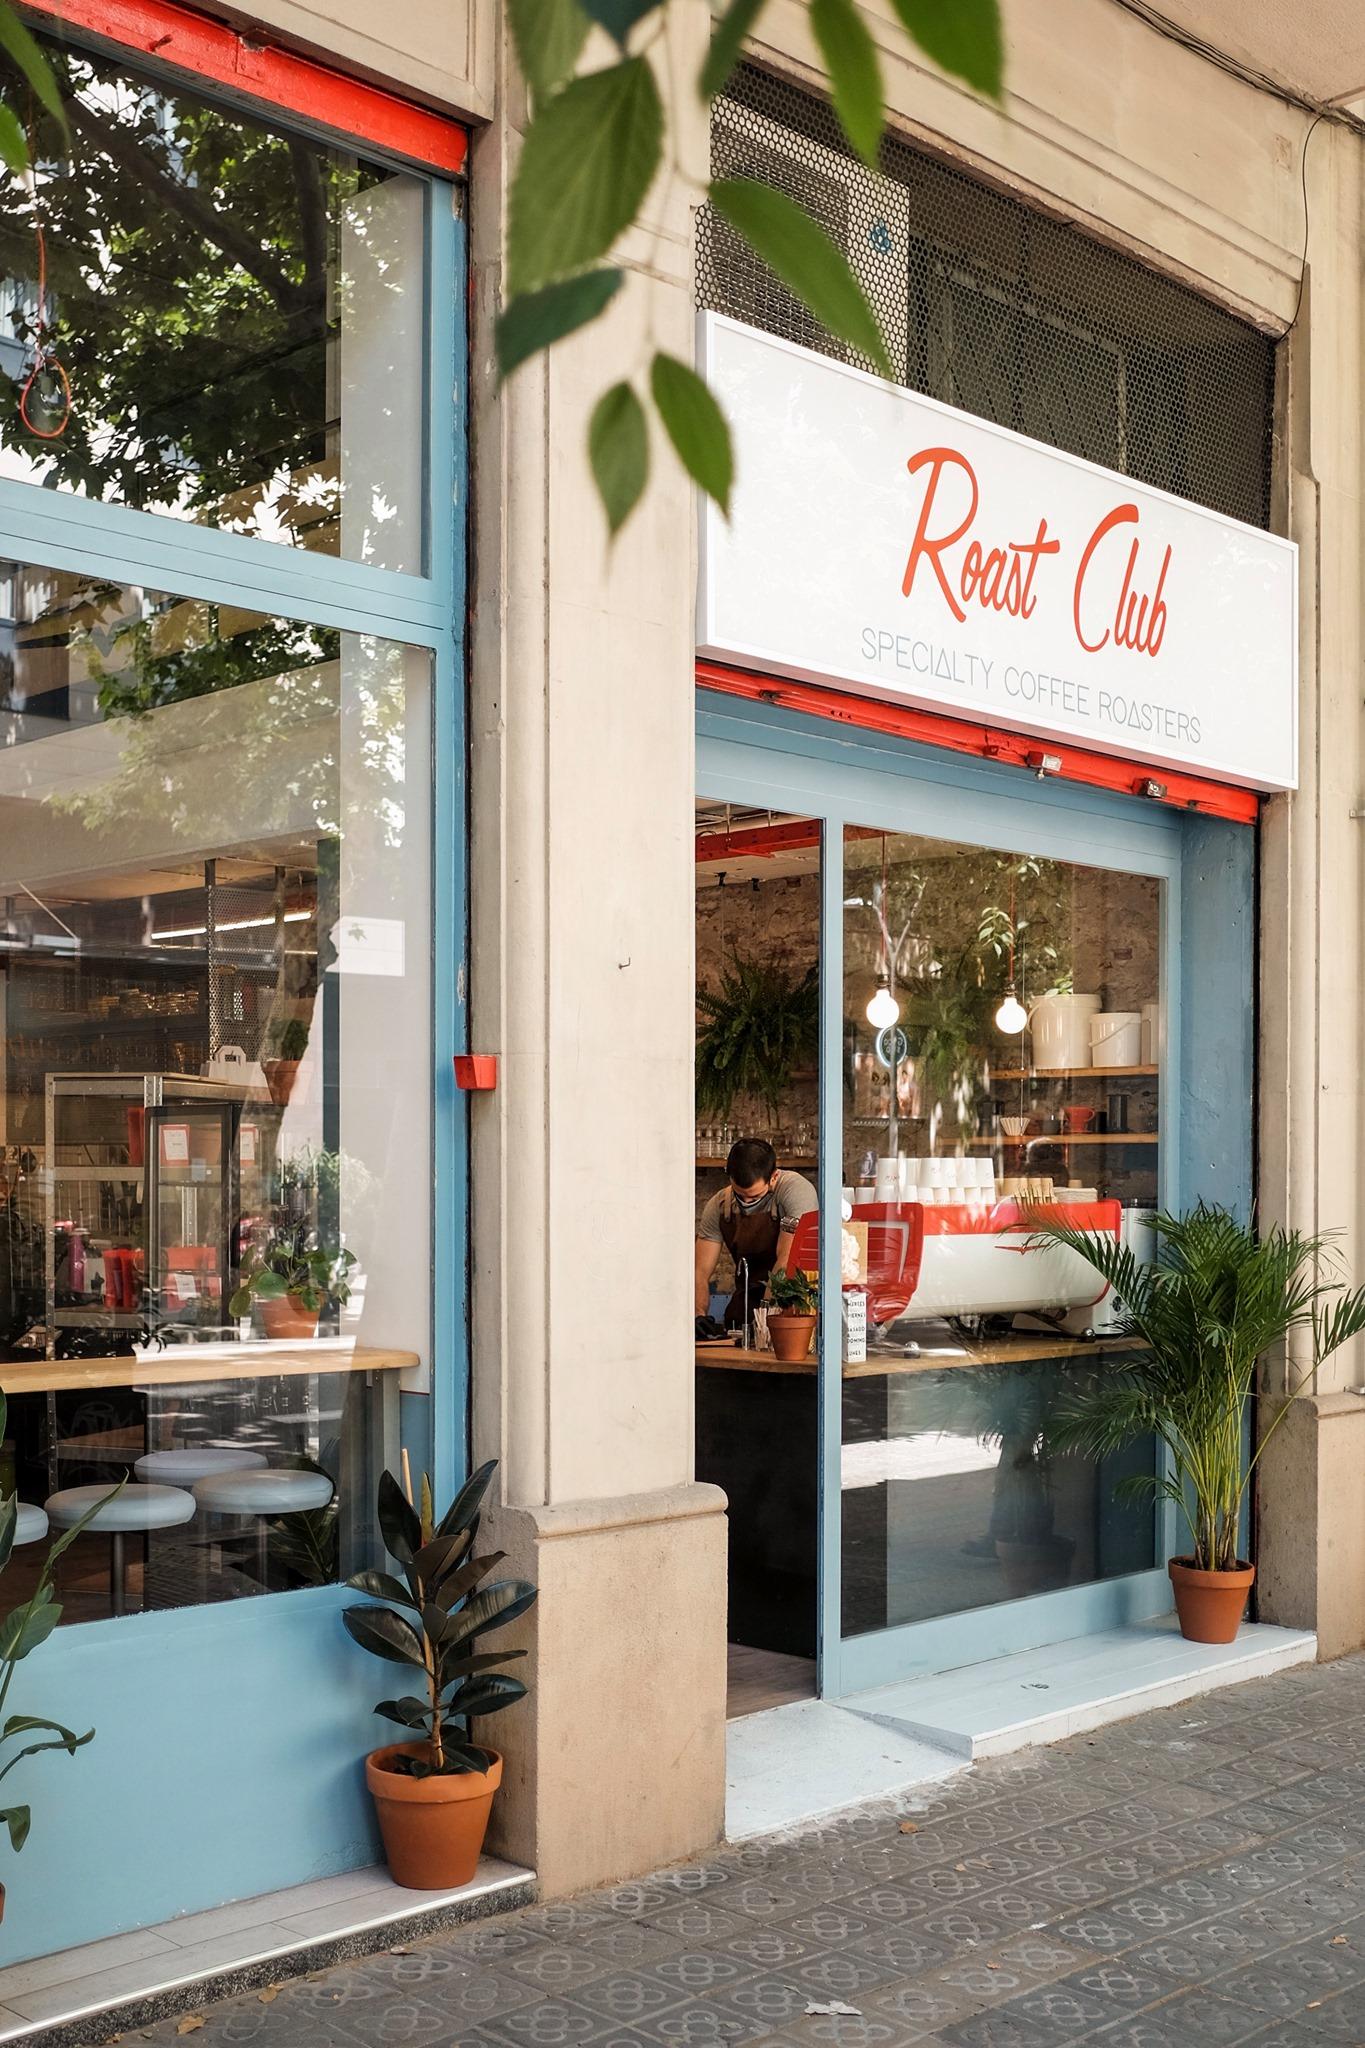 Roast Club cafeteria